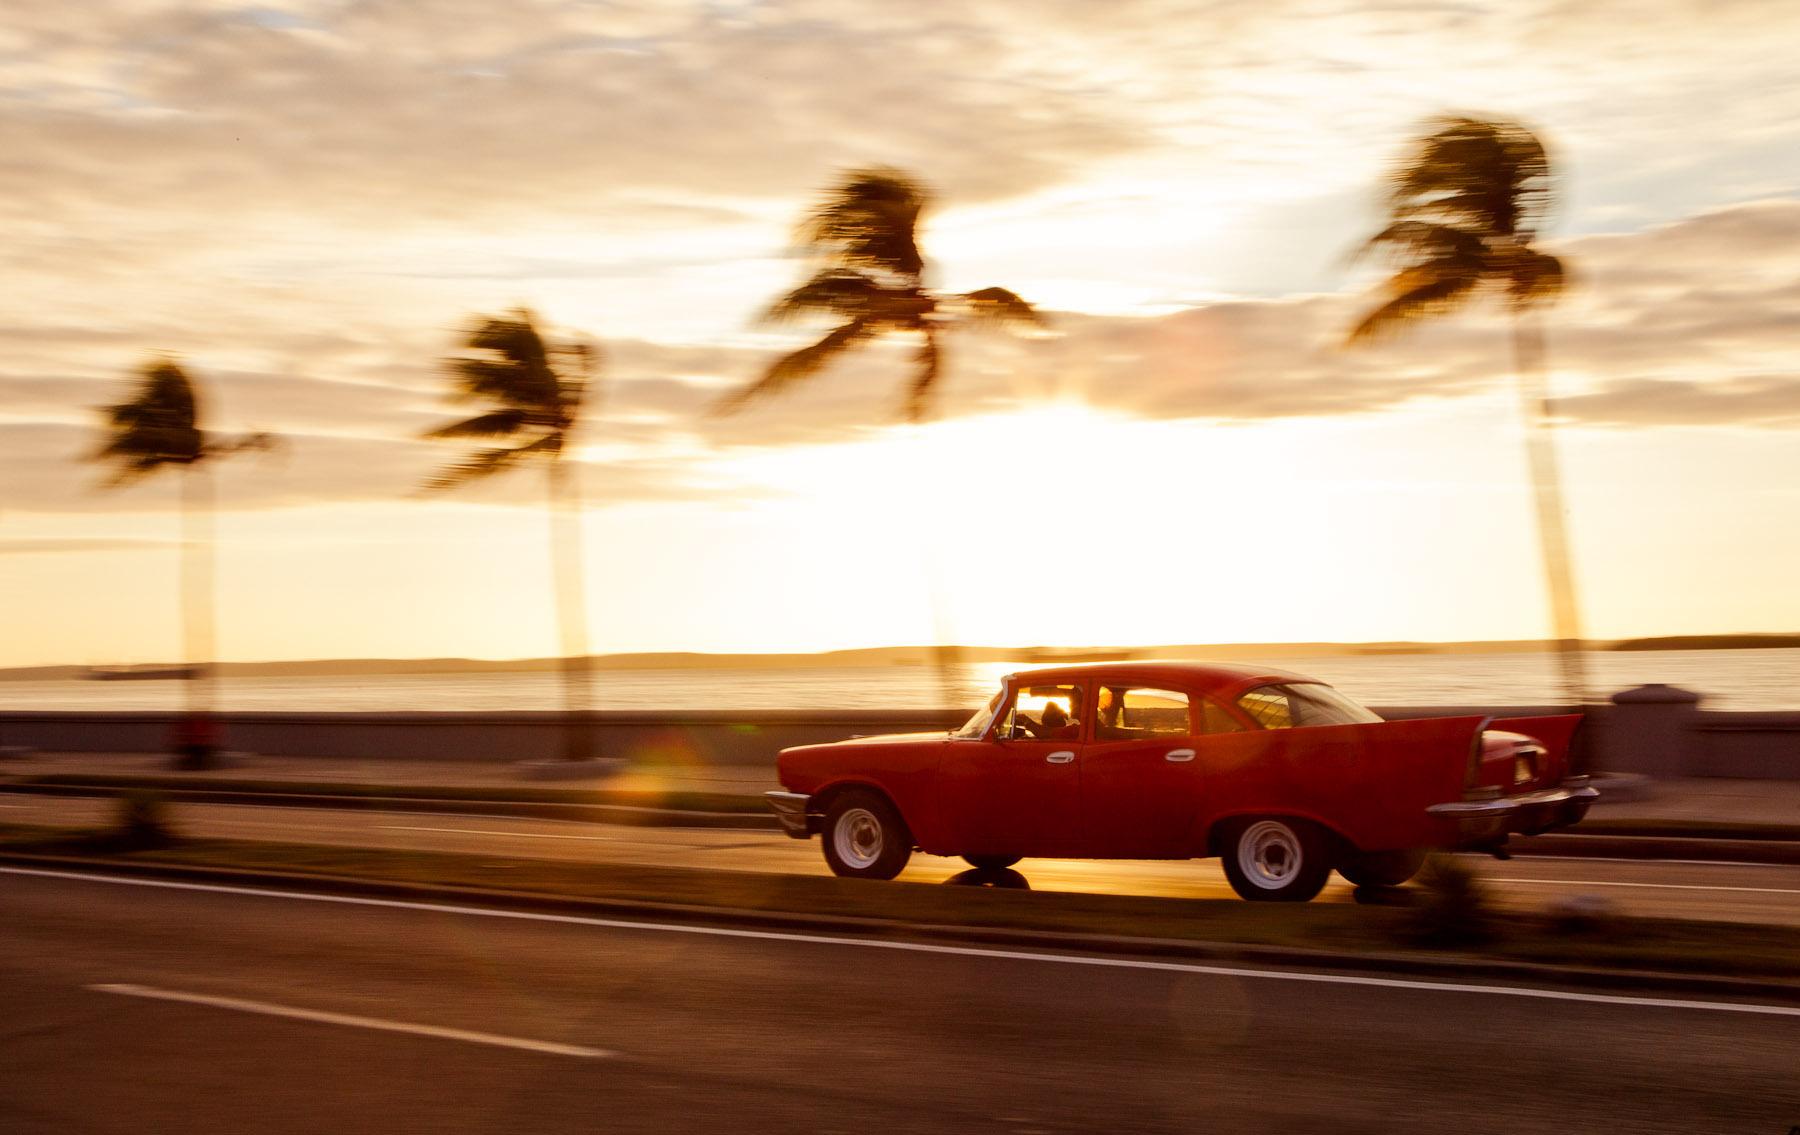 Cruising Sophie Goldsworthy Photography